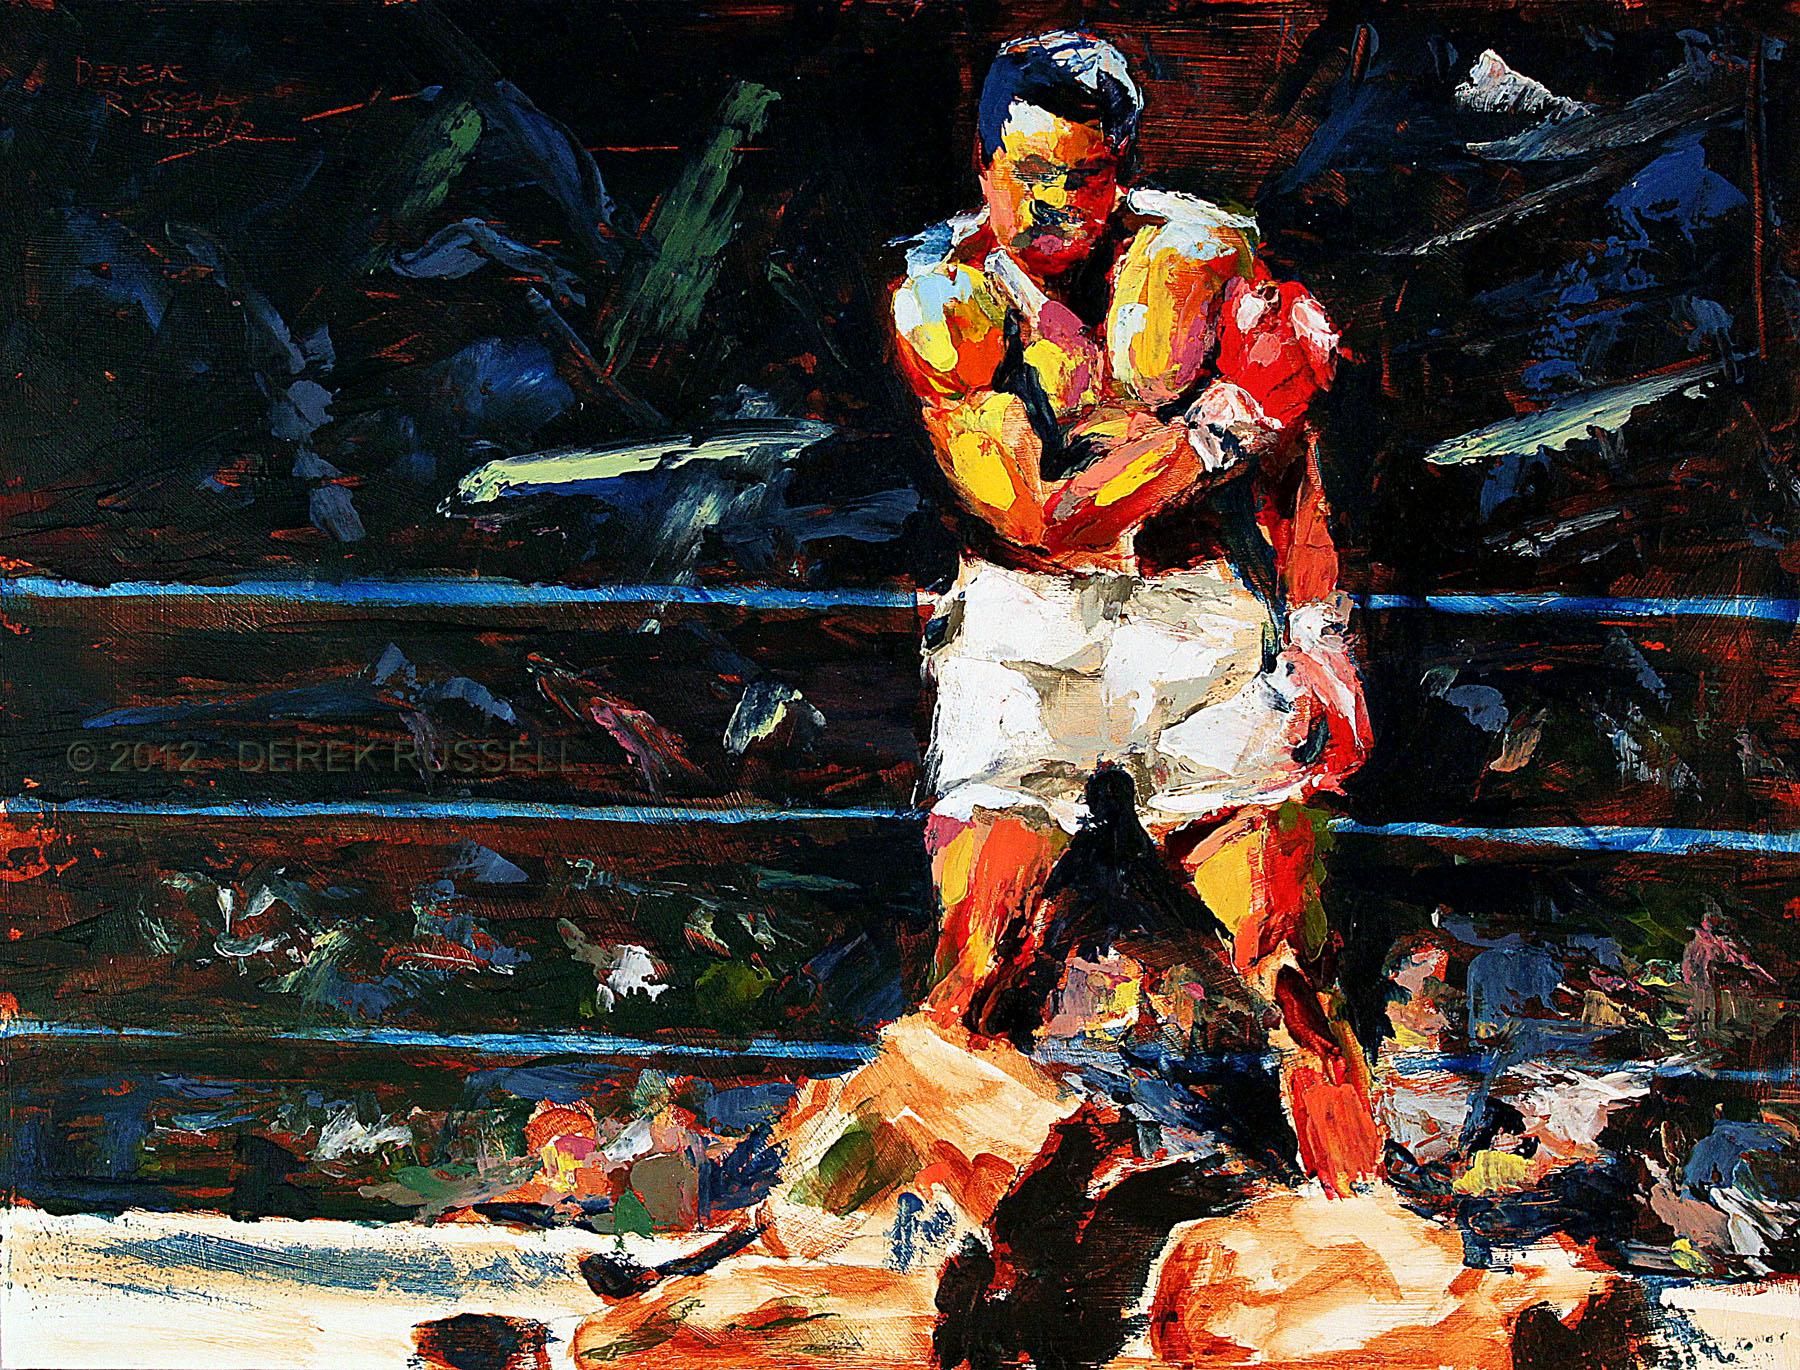 Muhammad Ali Original Fine Art Oil Painting by Celebrity & Corporate Artist Derek Russell